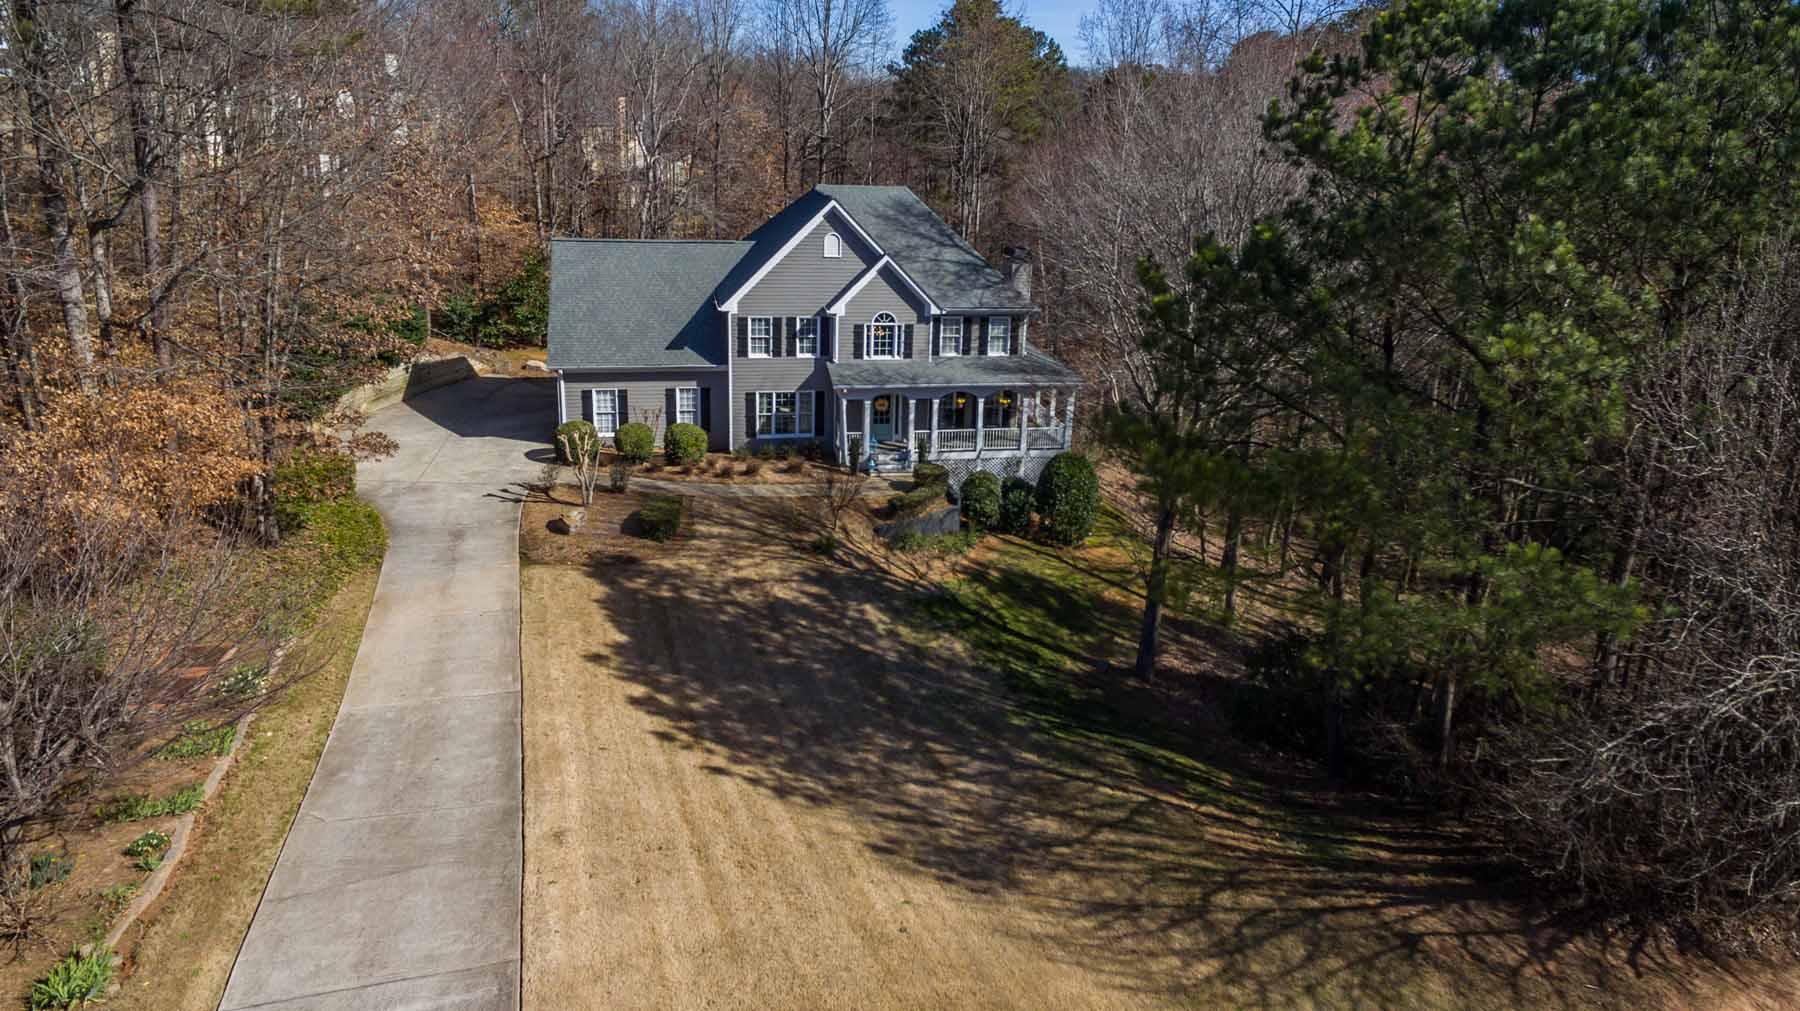 Single Family Home for Sale at Fabulous Farmhouse in South Forsyth 3130 English Oak Drive Cumming, Georgia, 30041 United States